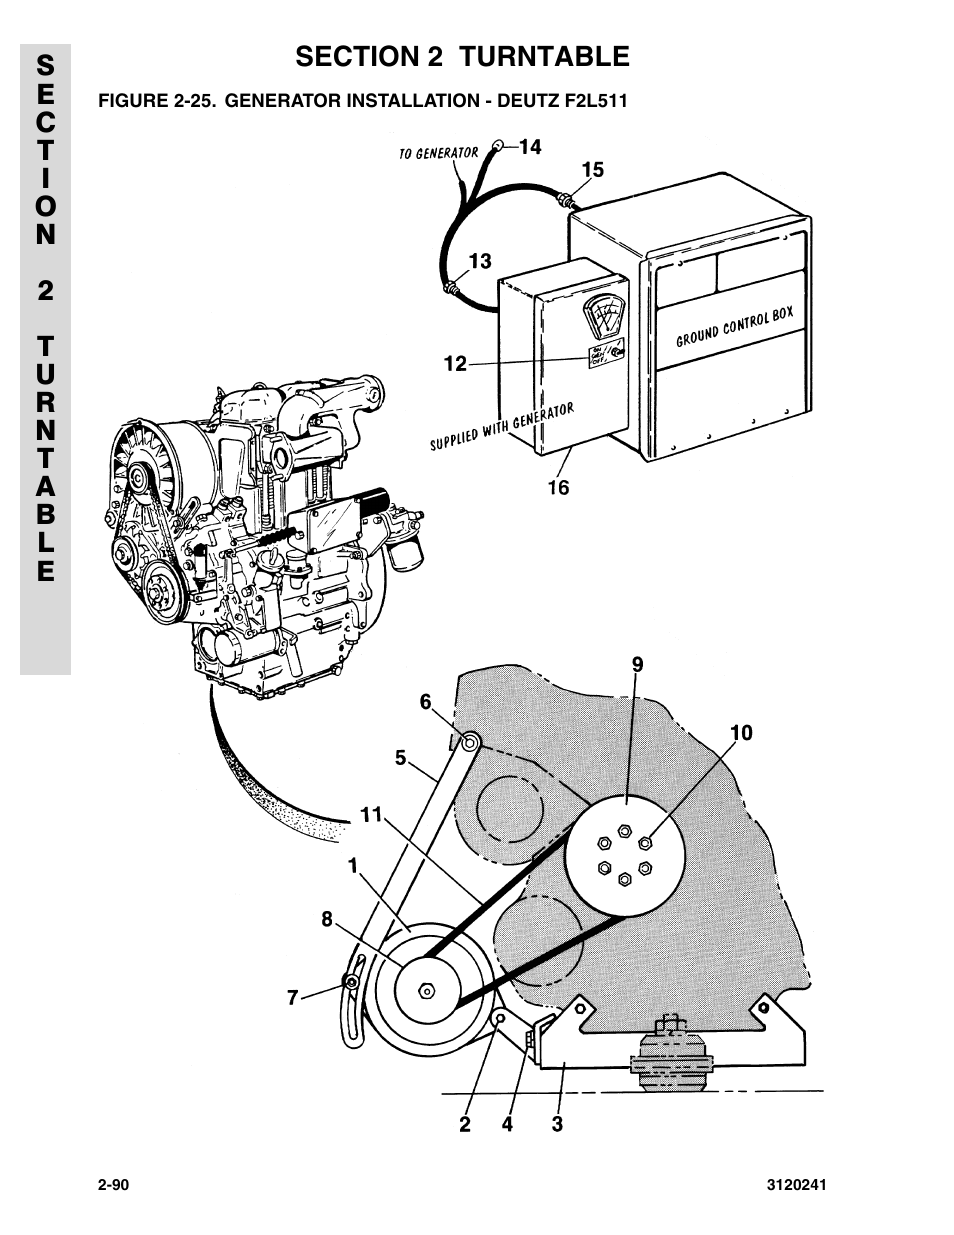 figure 2 25 generator installation deutz f2l511 jlg 40h parts rh manualsdir  com deutz f2l511 manual download deutz f2l511 engine manual